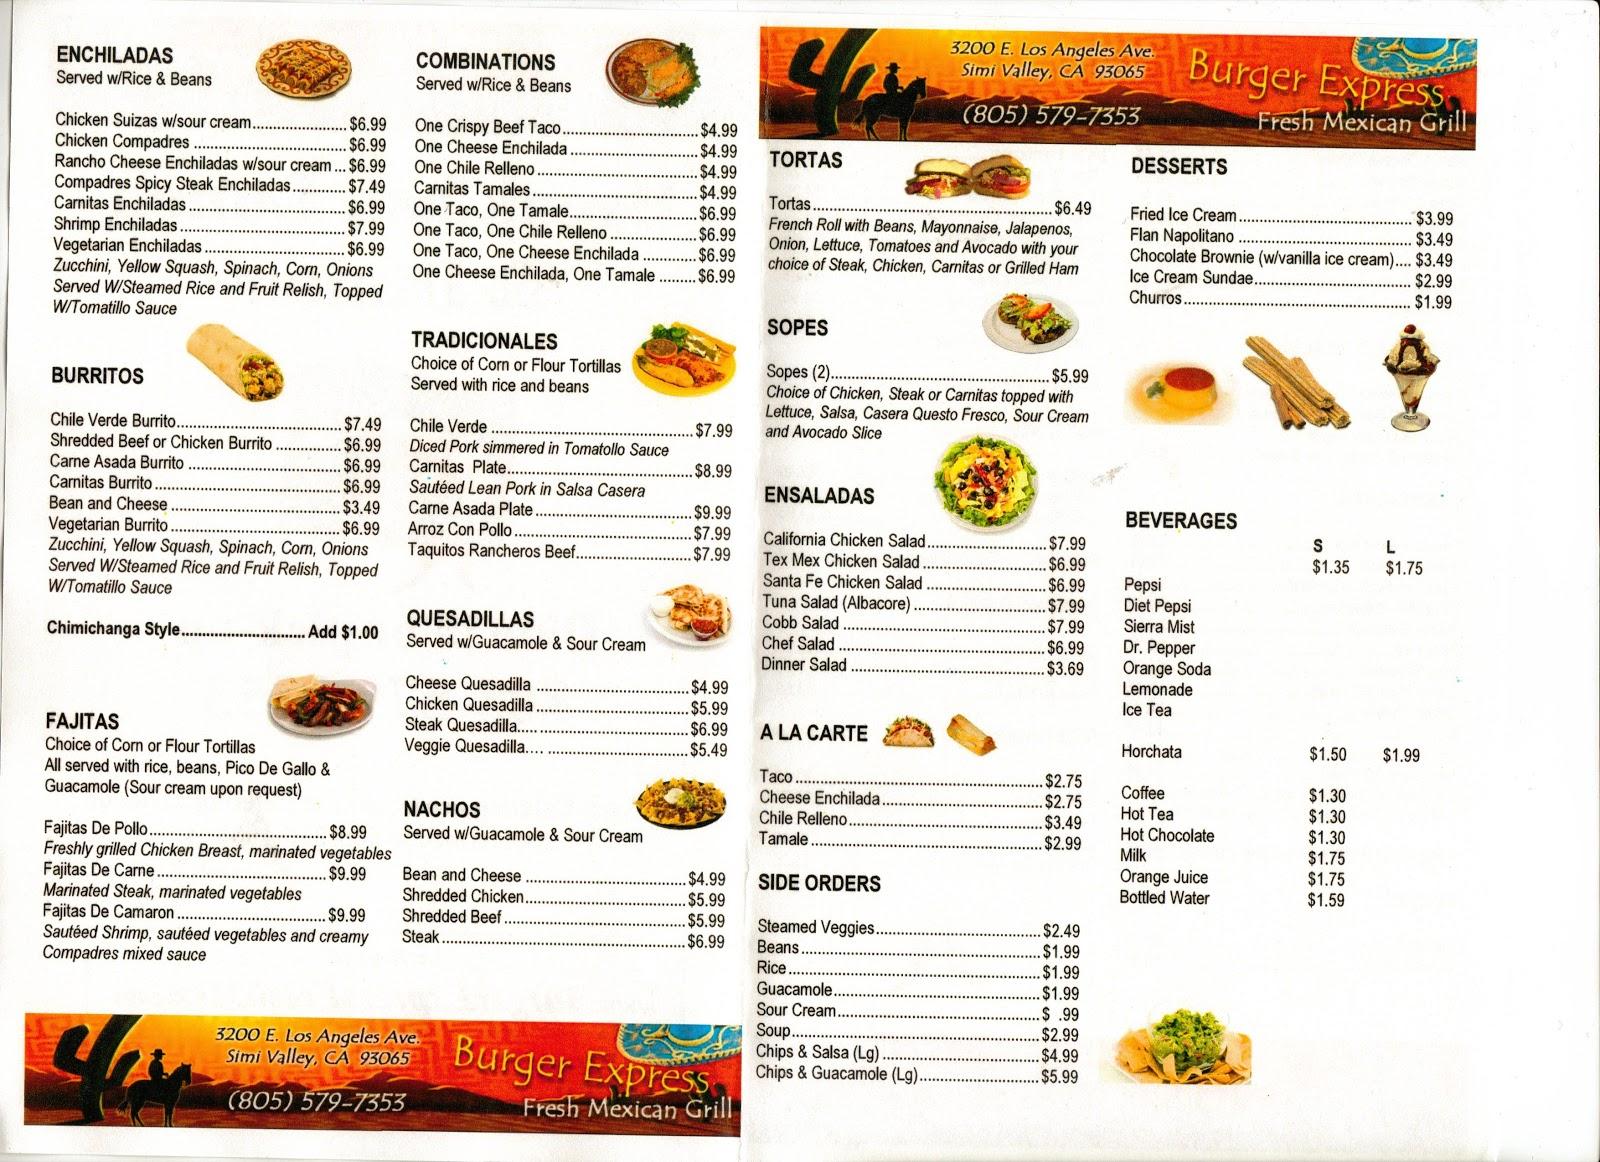 VC Menu: Burger Express Fresh Mexican - Simi Valley